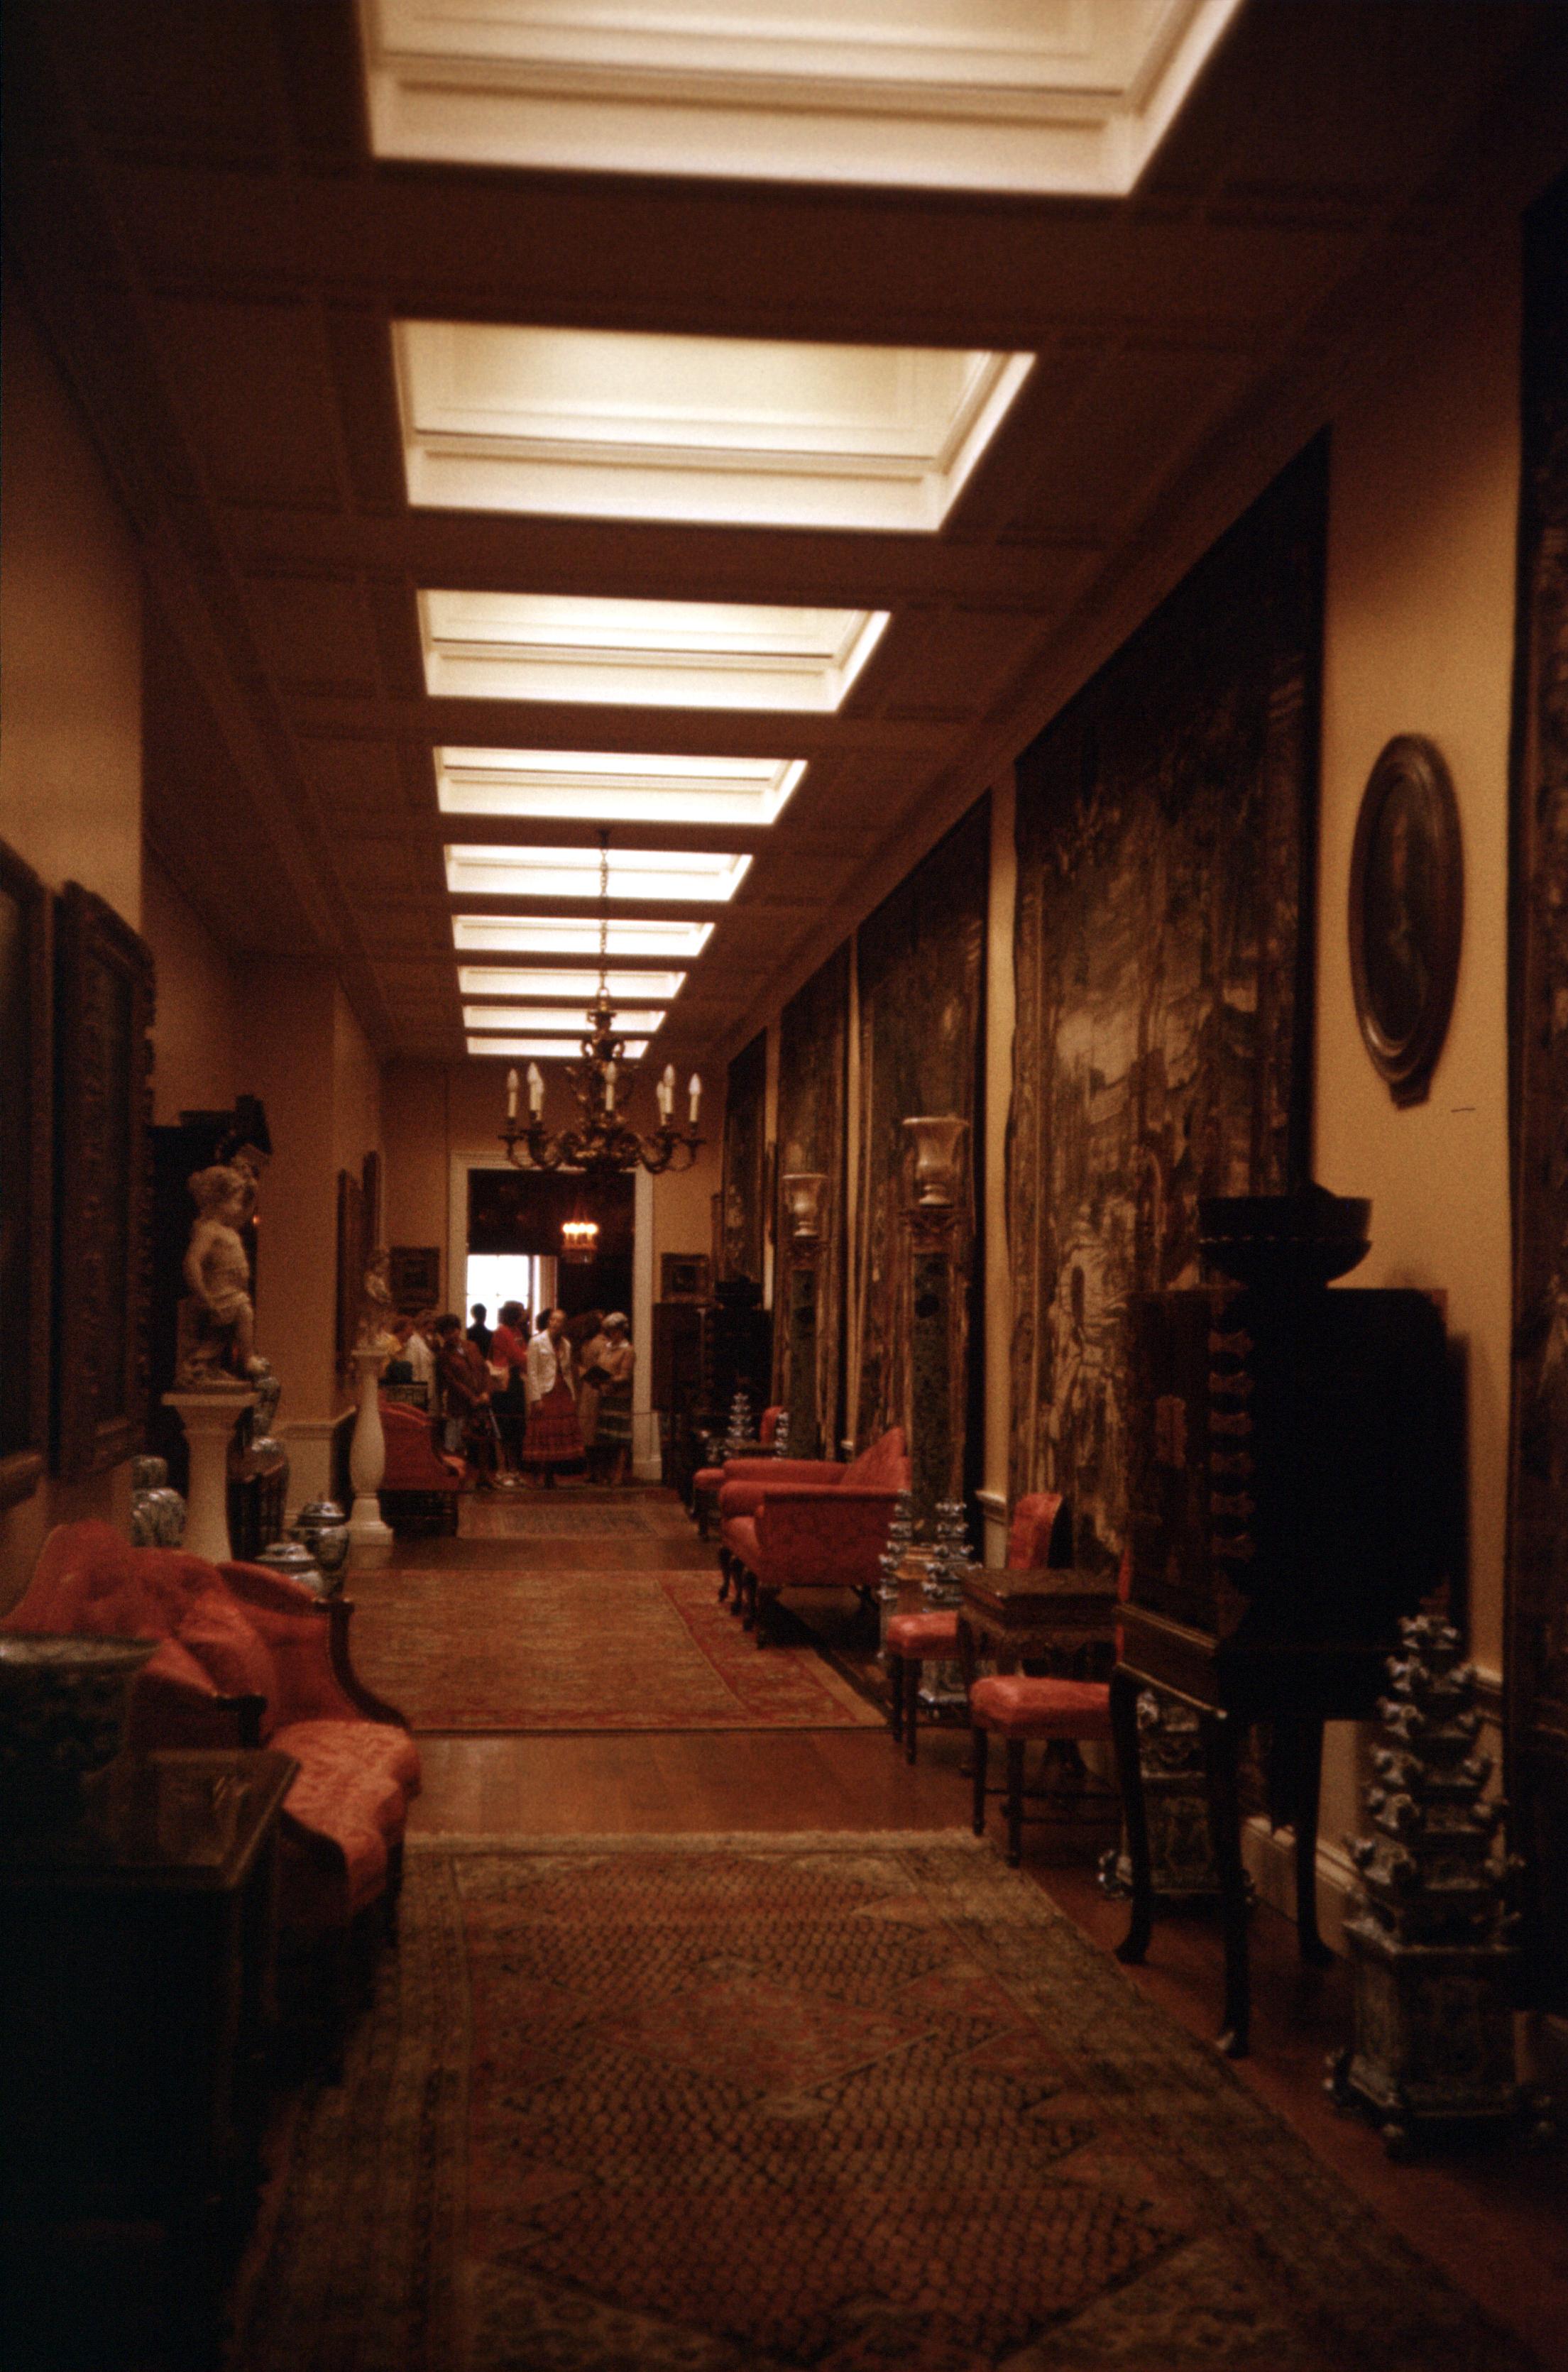 File:Interior of Chatsworth House, July 1978.jpg ...